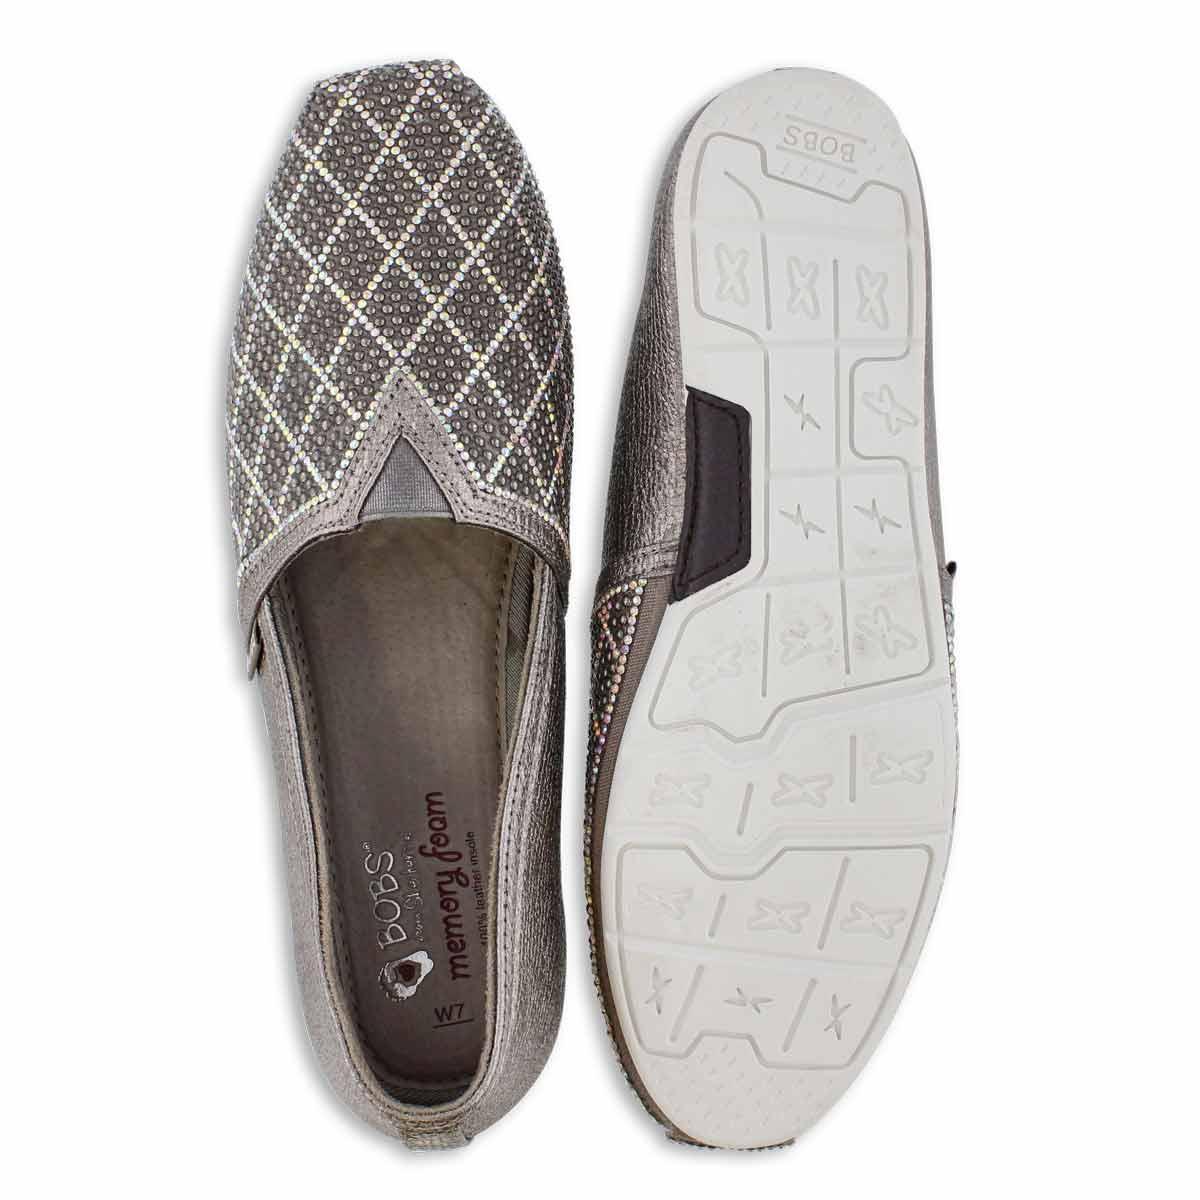 Lds Bobs Luxe Elite pewter slip on shoe